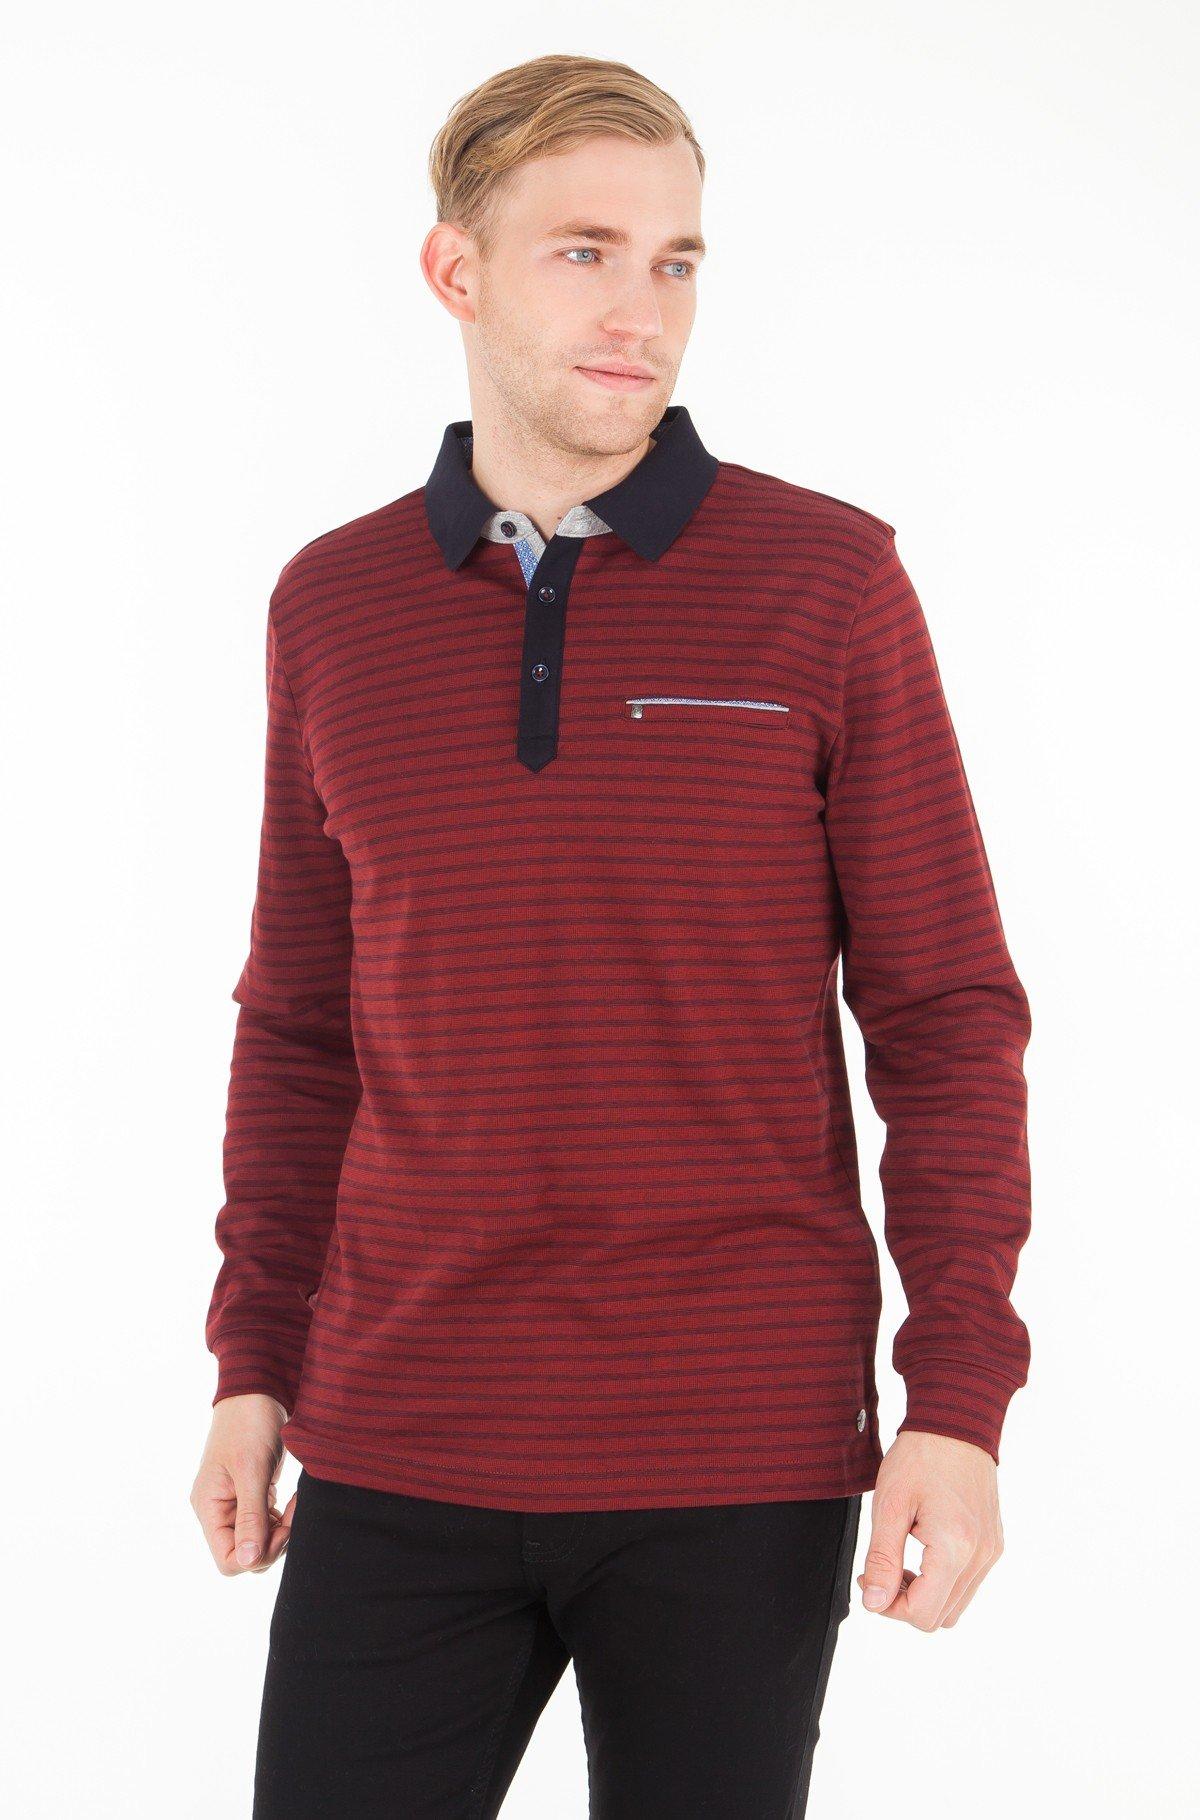 Polo marškinėliai ilgomis rankovėmis 53834-82311-full-1